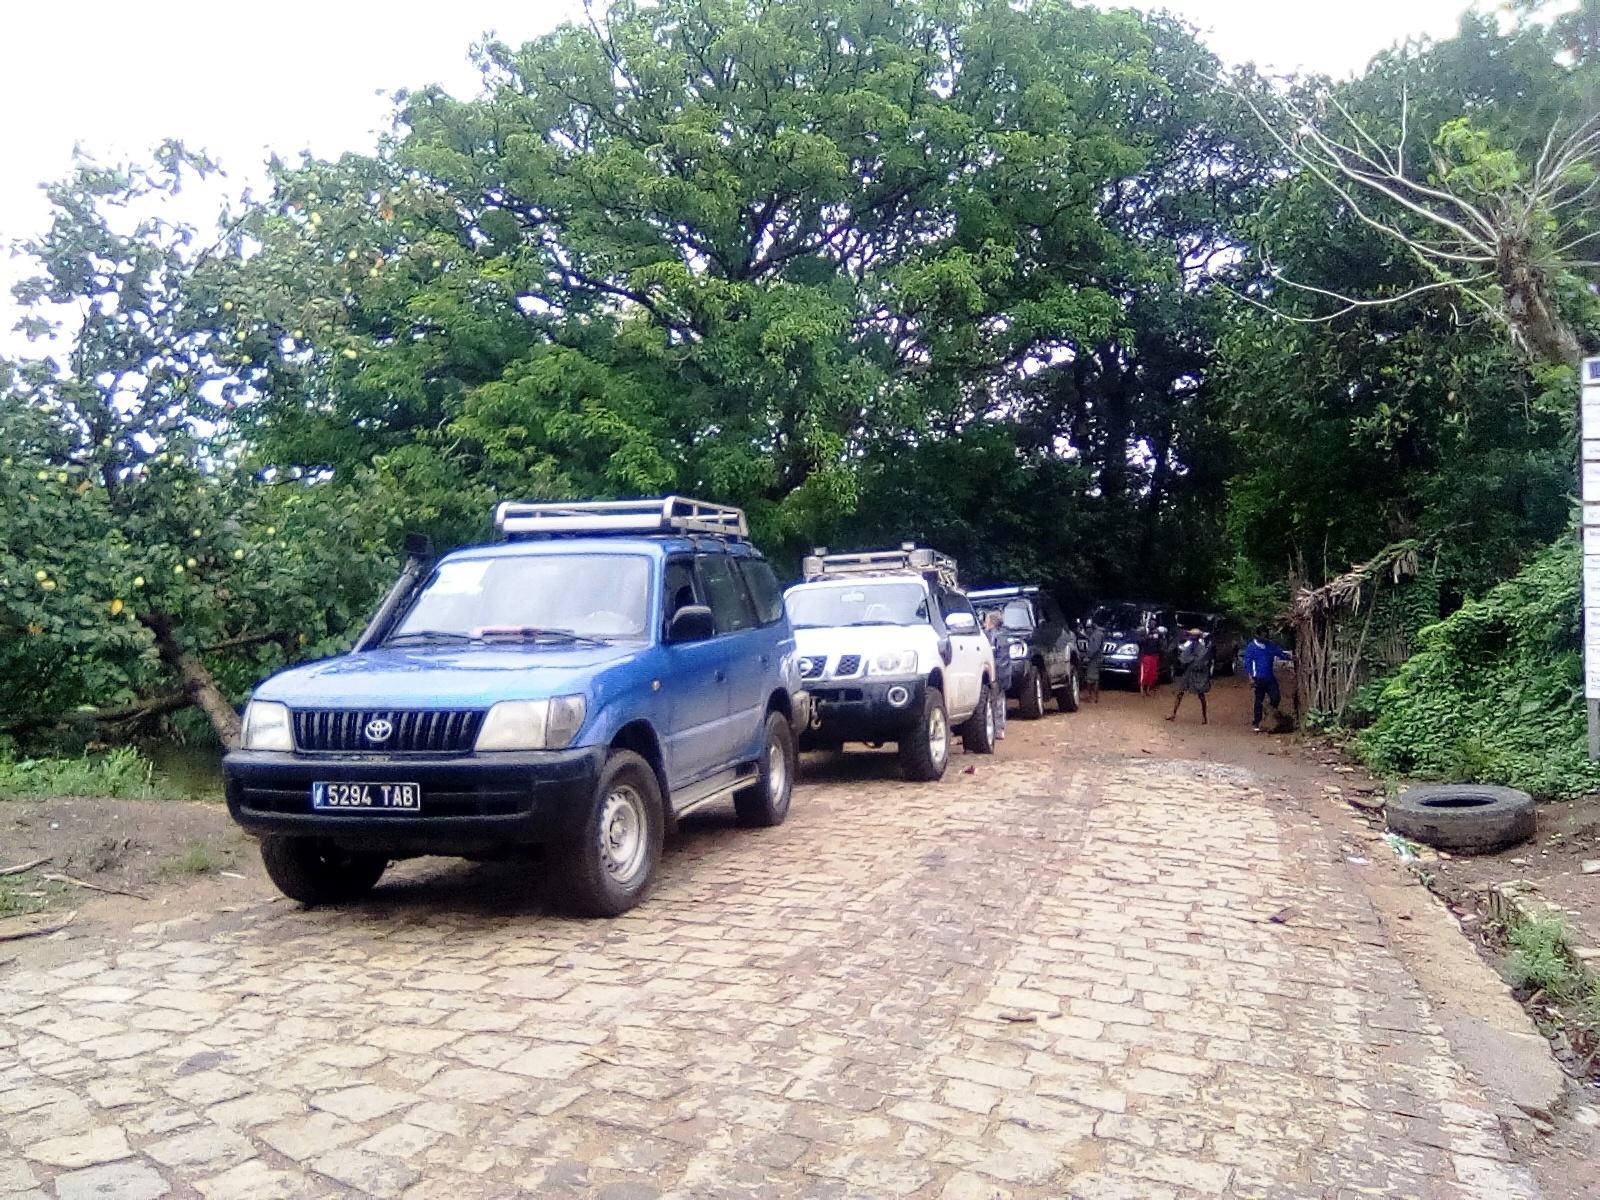 Route Tolagnaro to Tsitongambarika